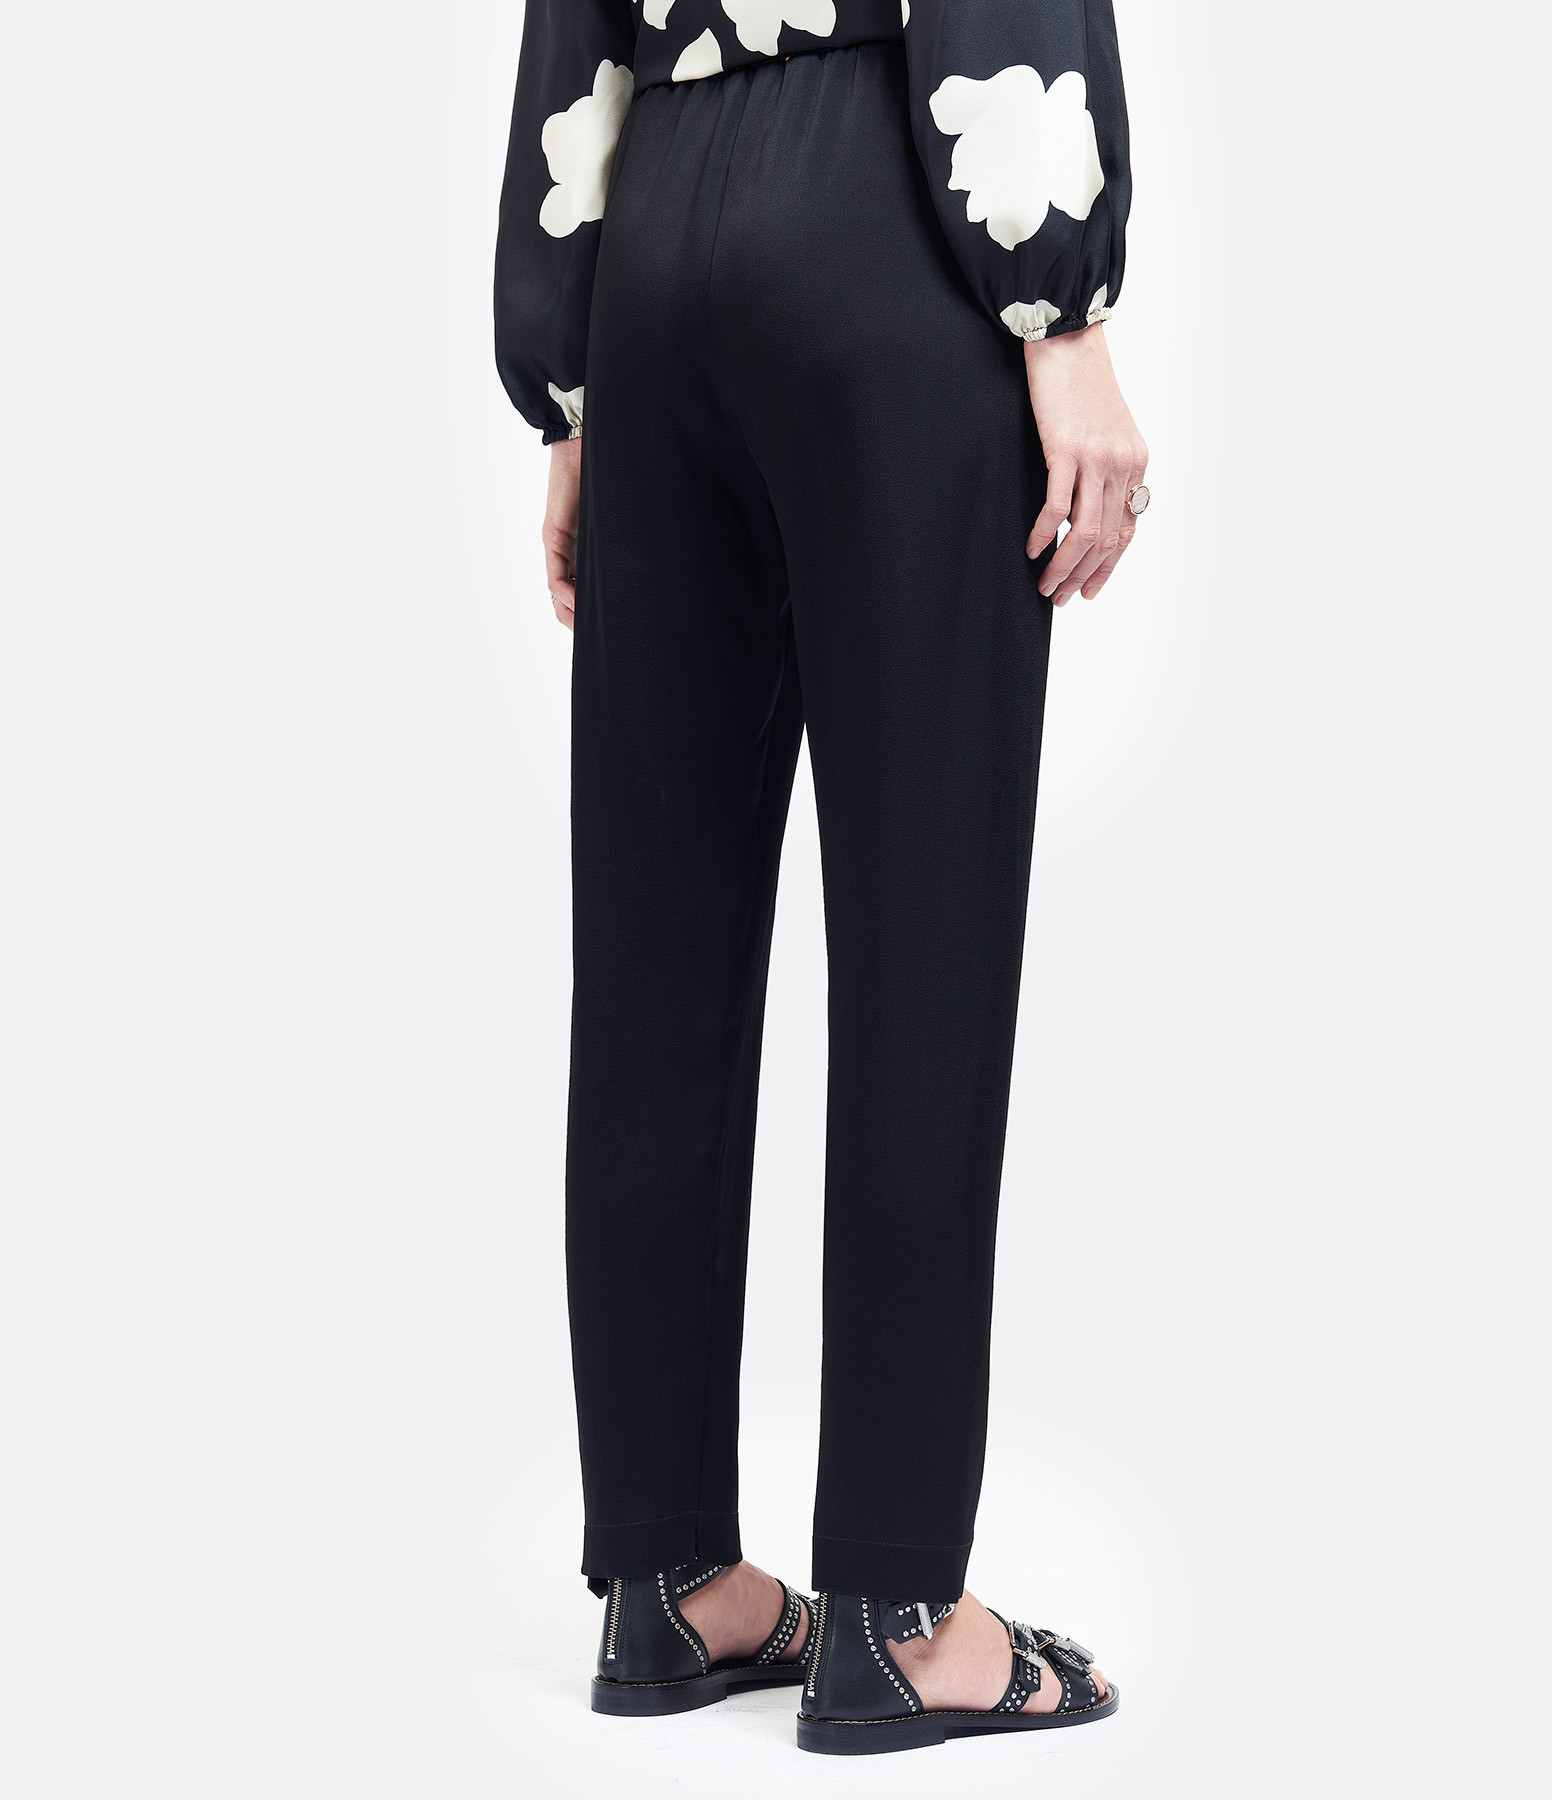 FORTE_FORTE - Pantalon Elastique Crêpe Satin Noir